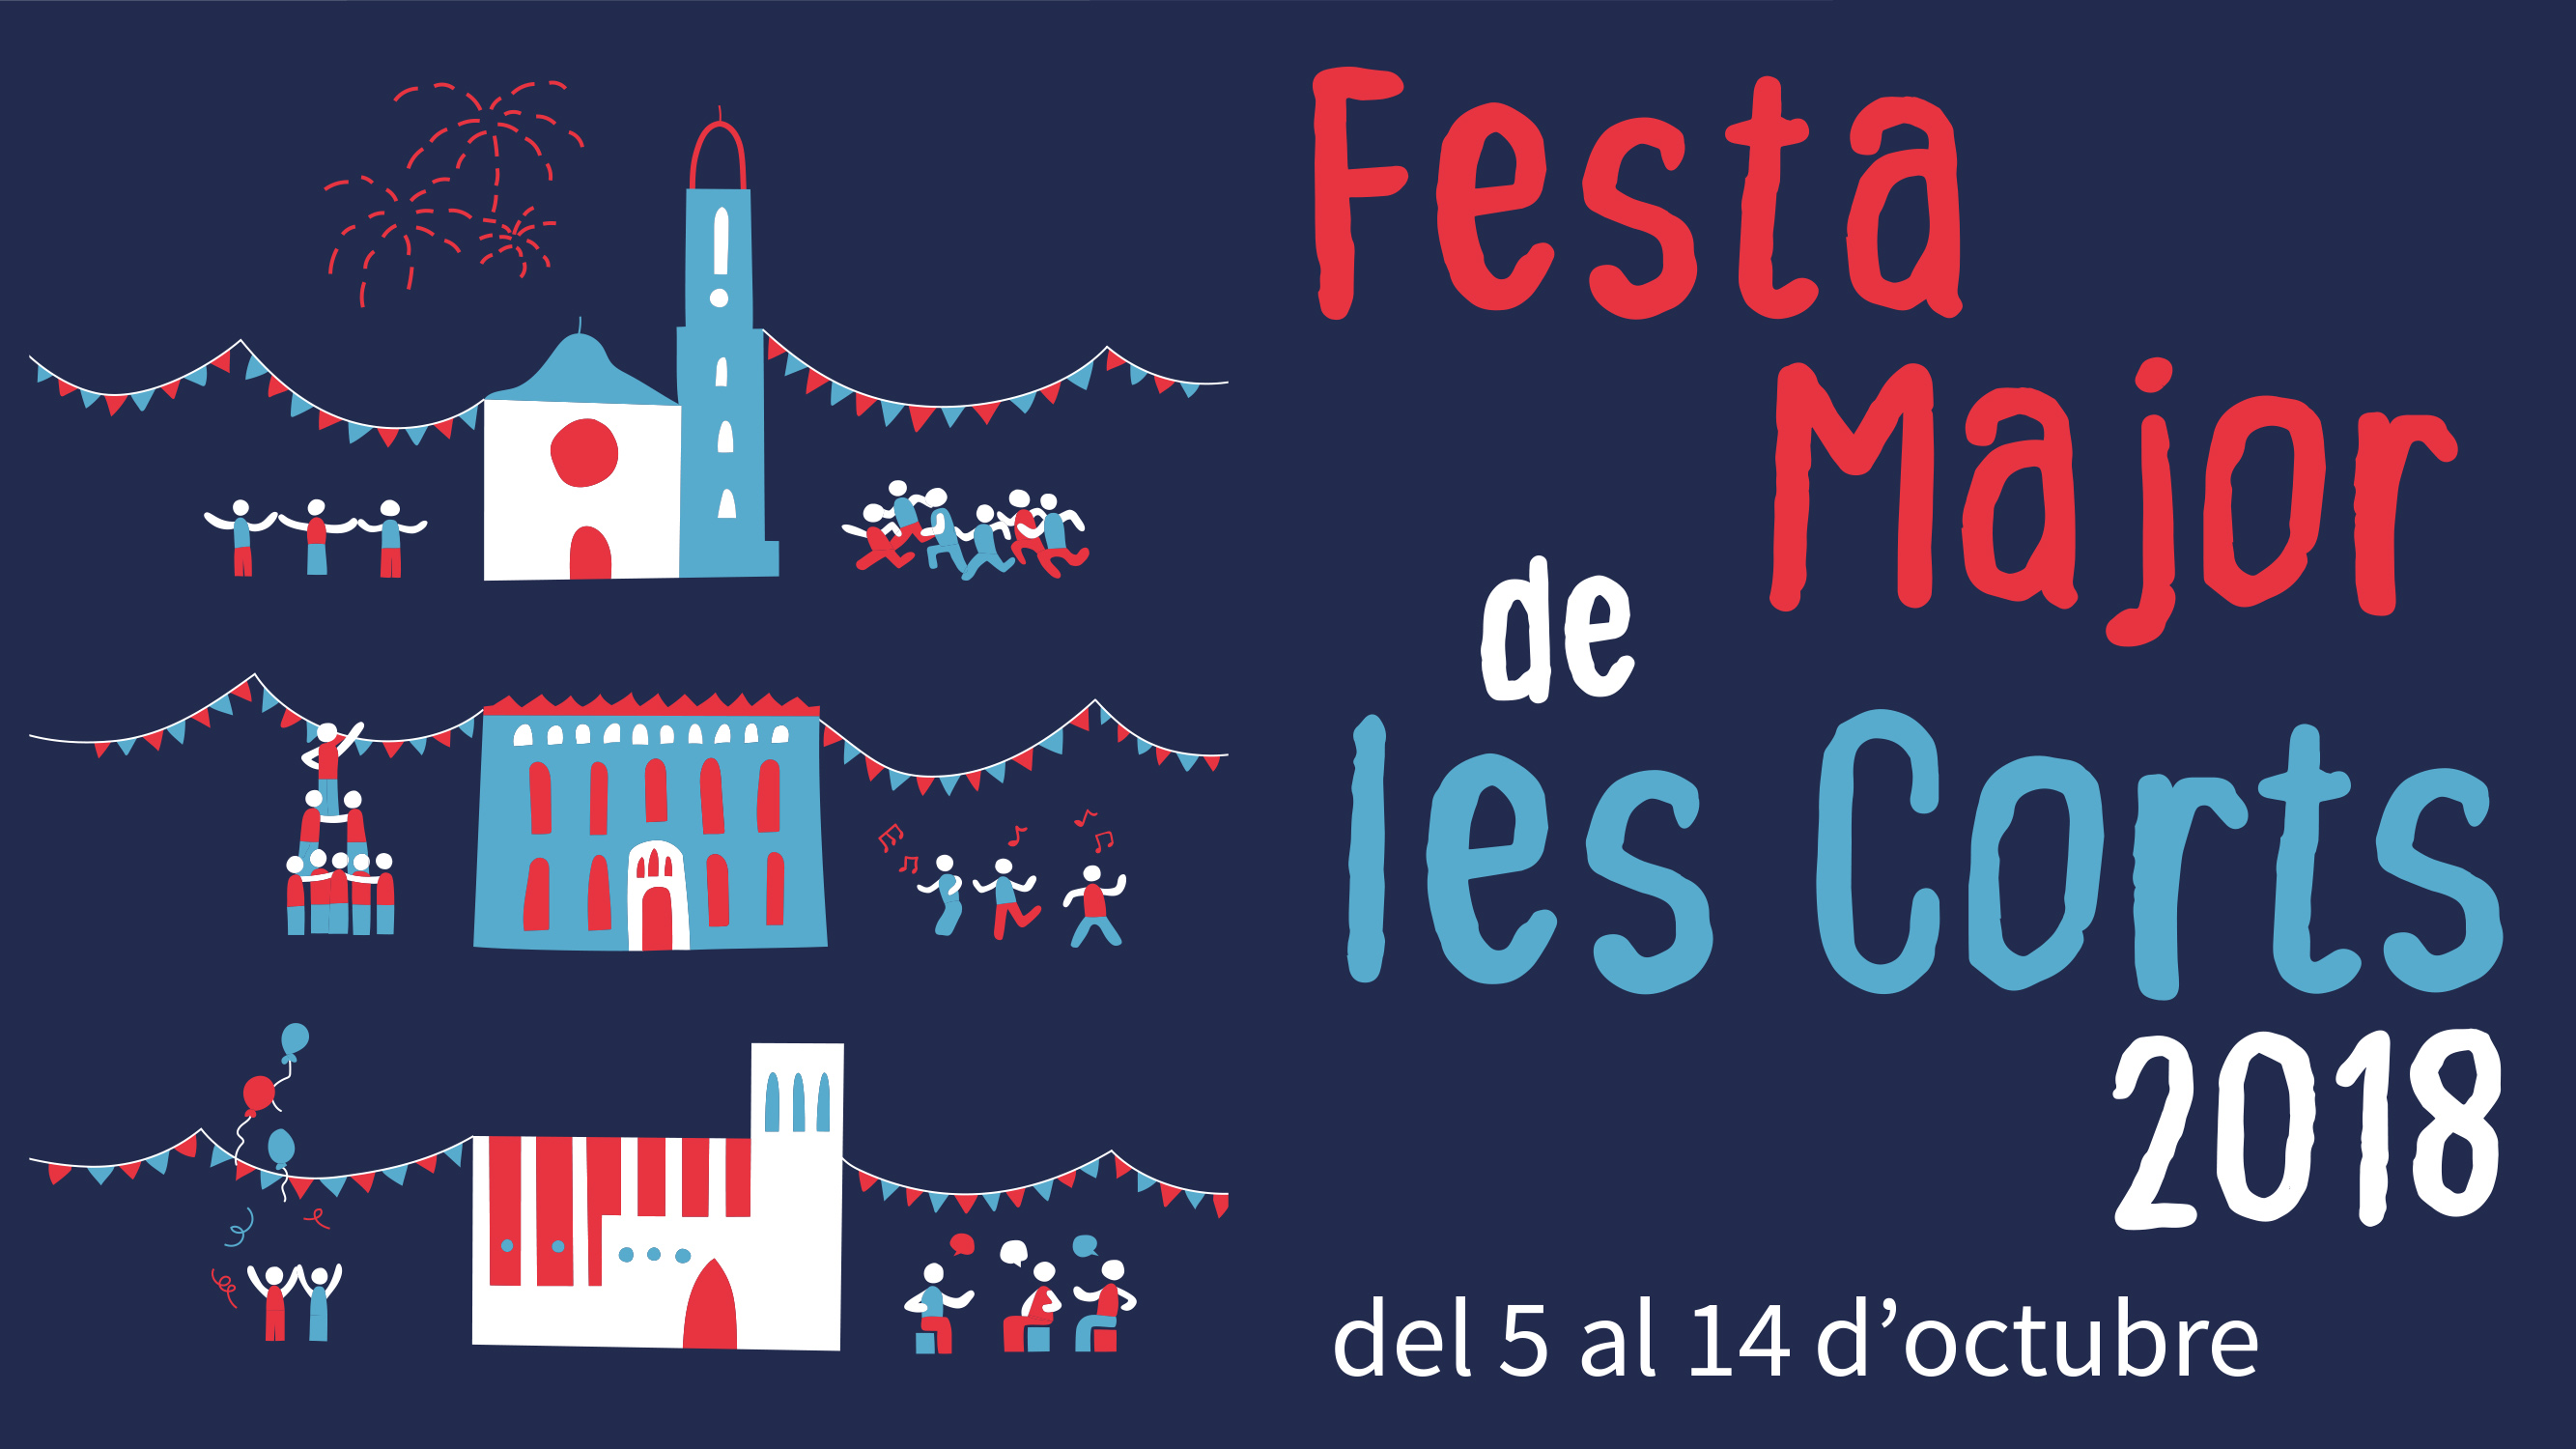 Fiestas de Les Corts